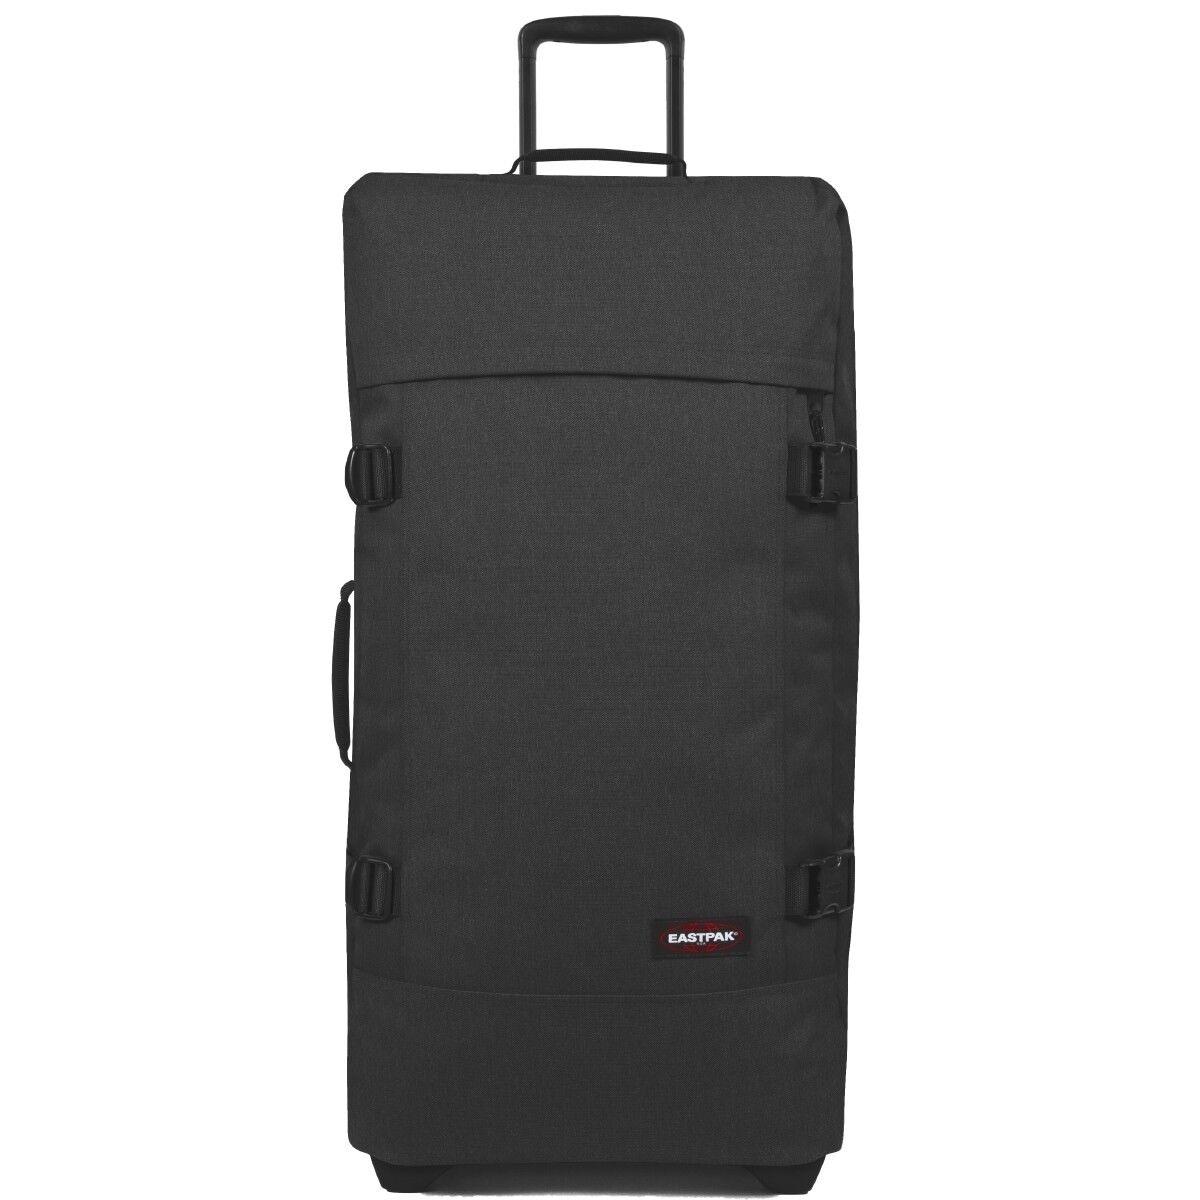 Eastpak Tranverz L Trolley Sac de voyage LOUD BLACK BLACK BLACK sac valise de voyage ek63l81w 4e7349